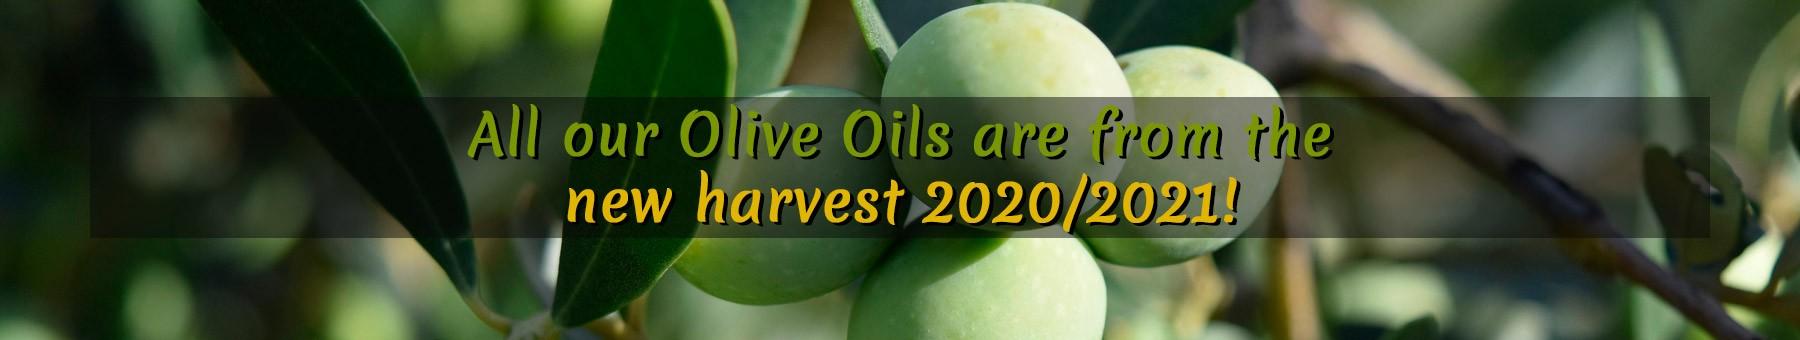 New harvest  2020/2021